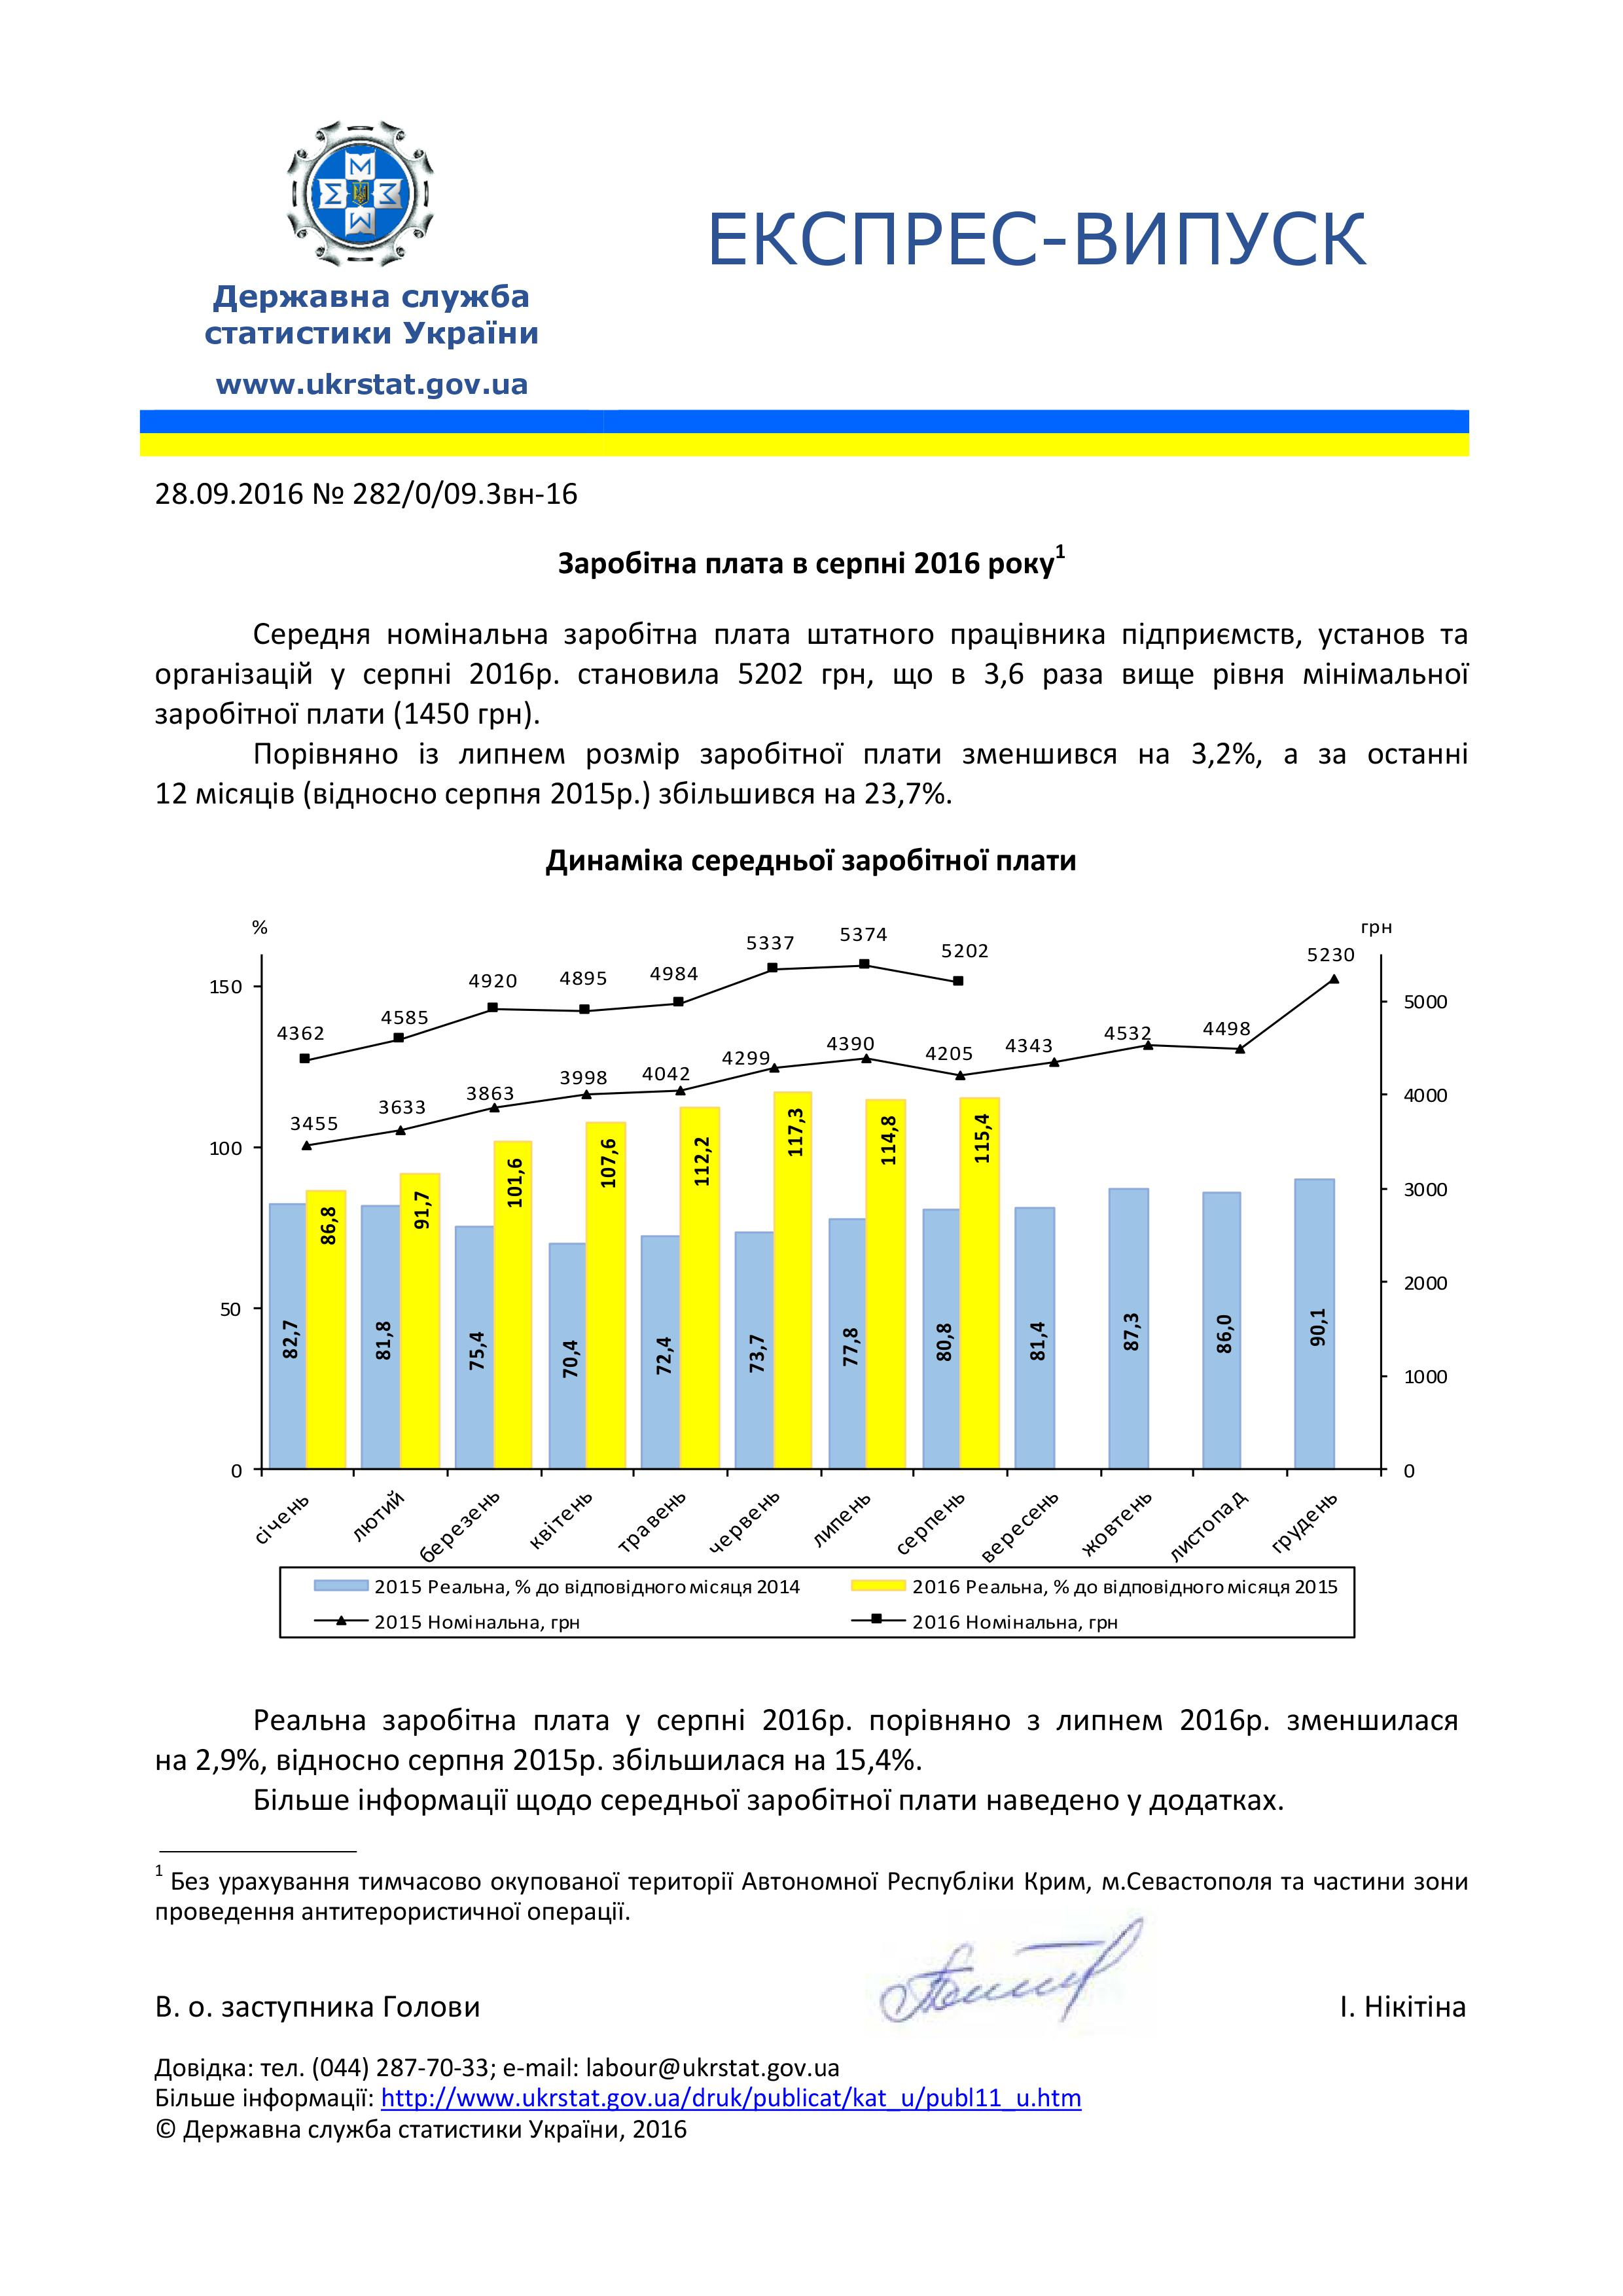 Реальна зарплата українців за рік зросла на 15% - фото 1